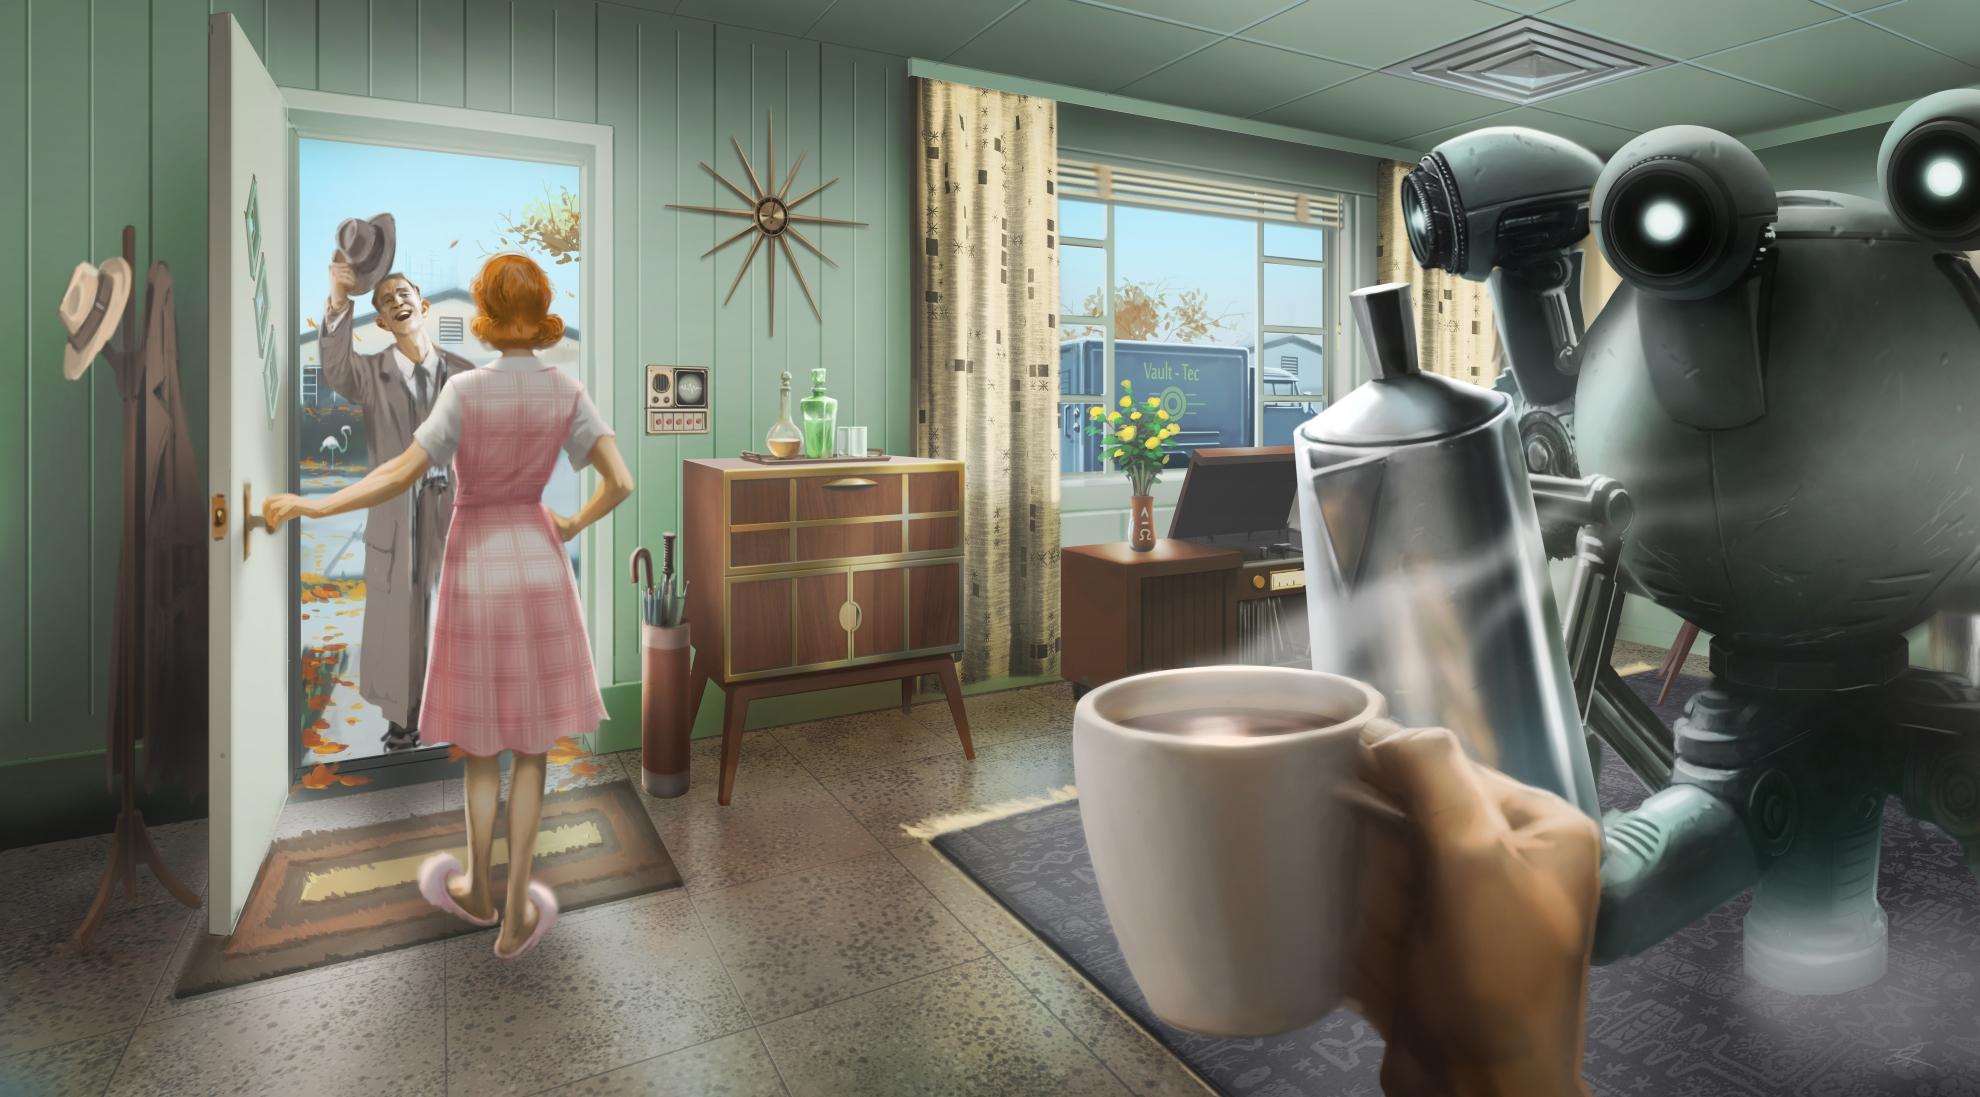 Fallout 4 Pre War Concept Art - HD Wallpaper